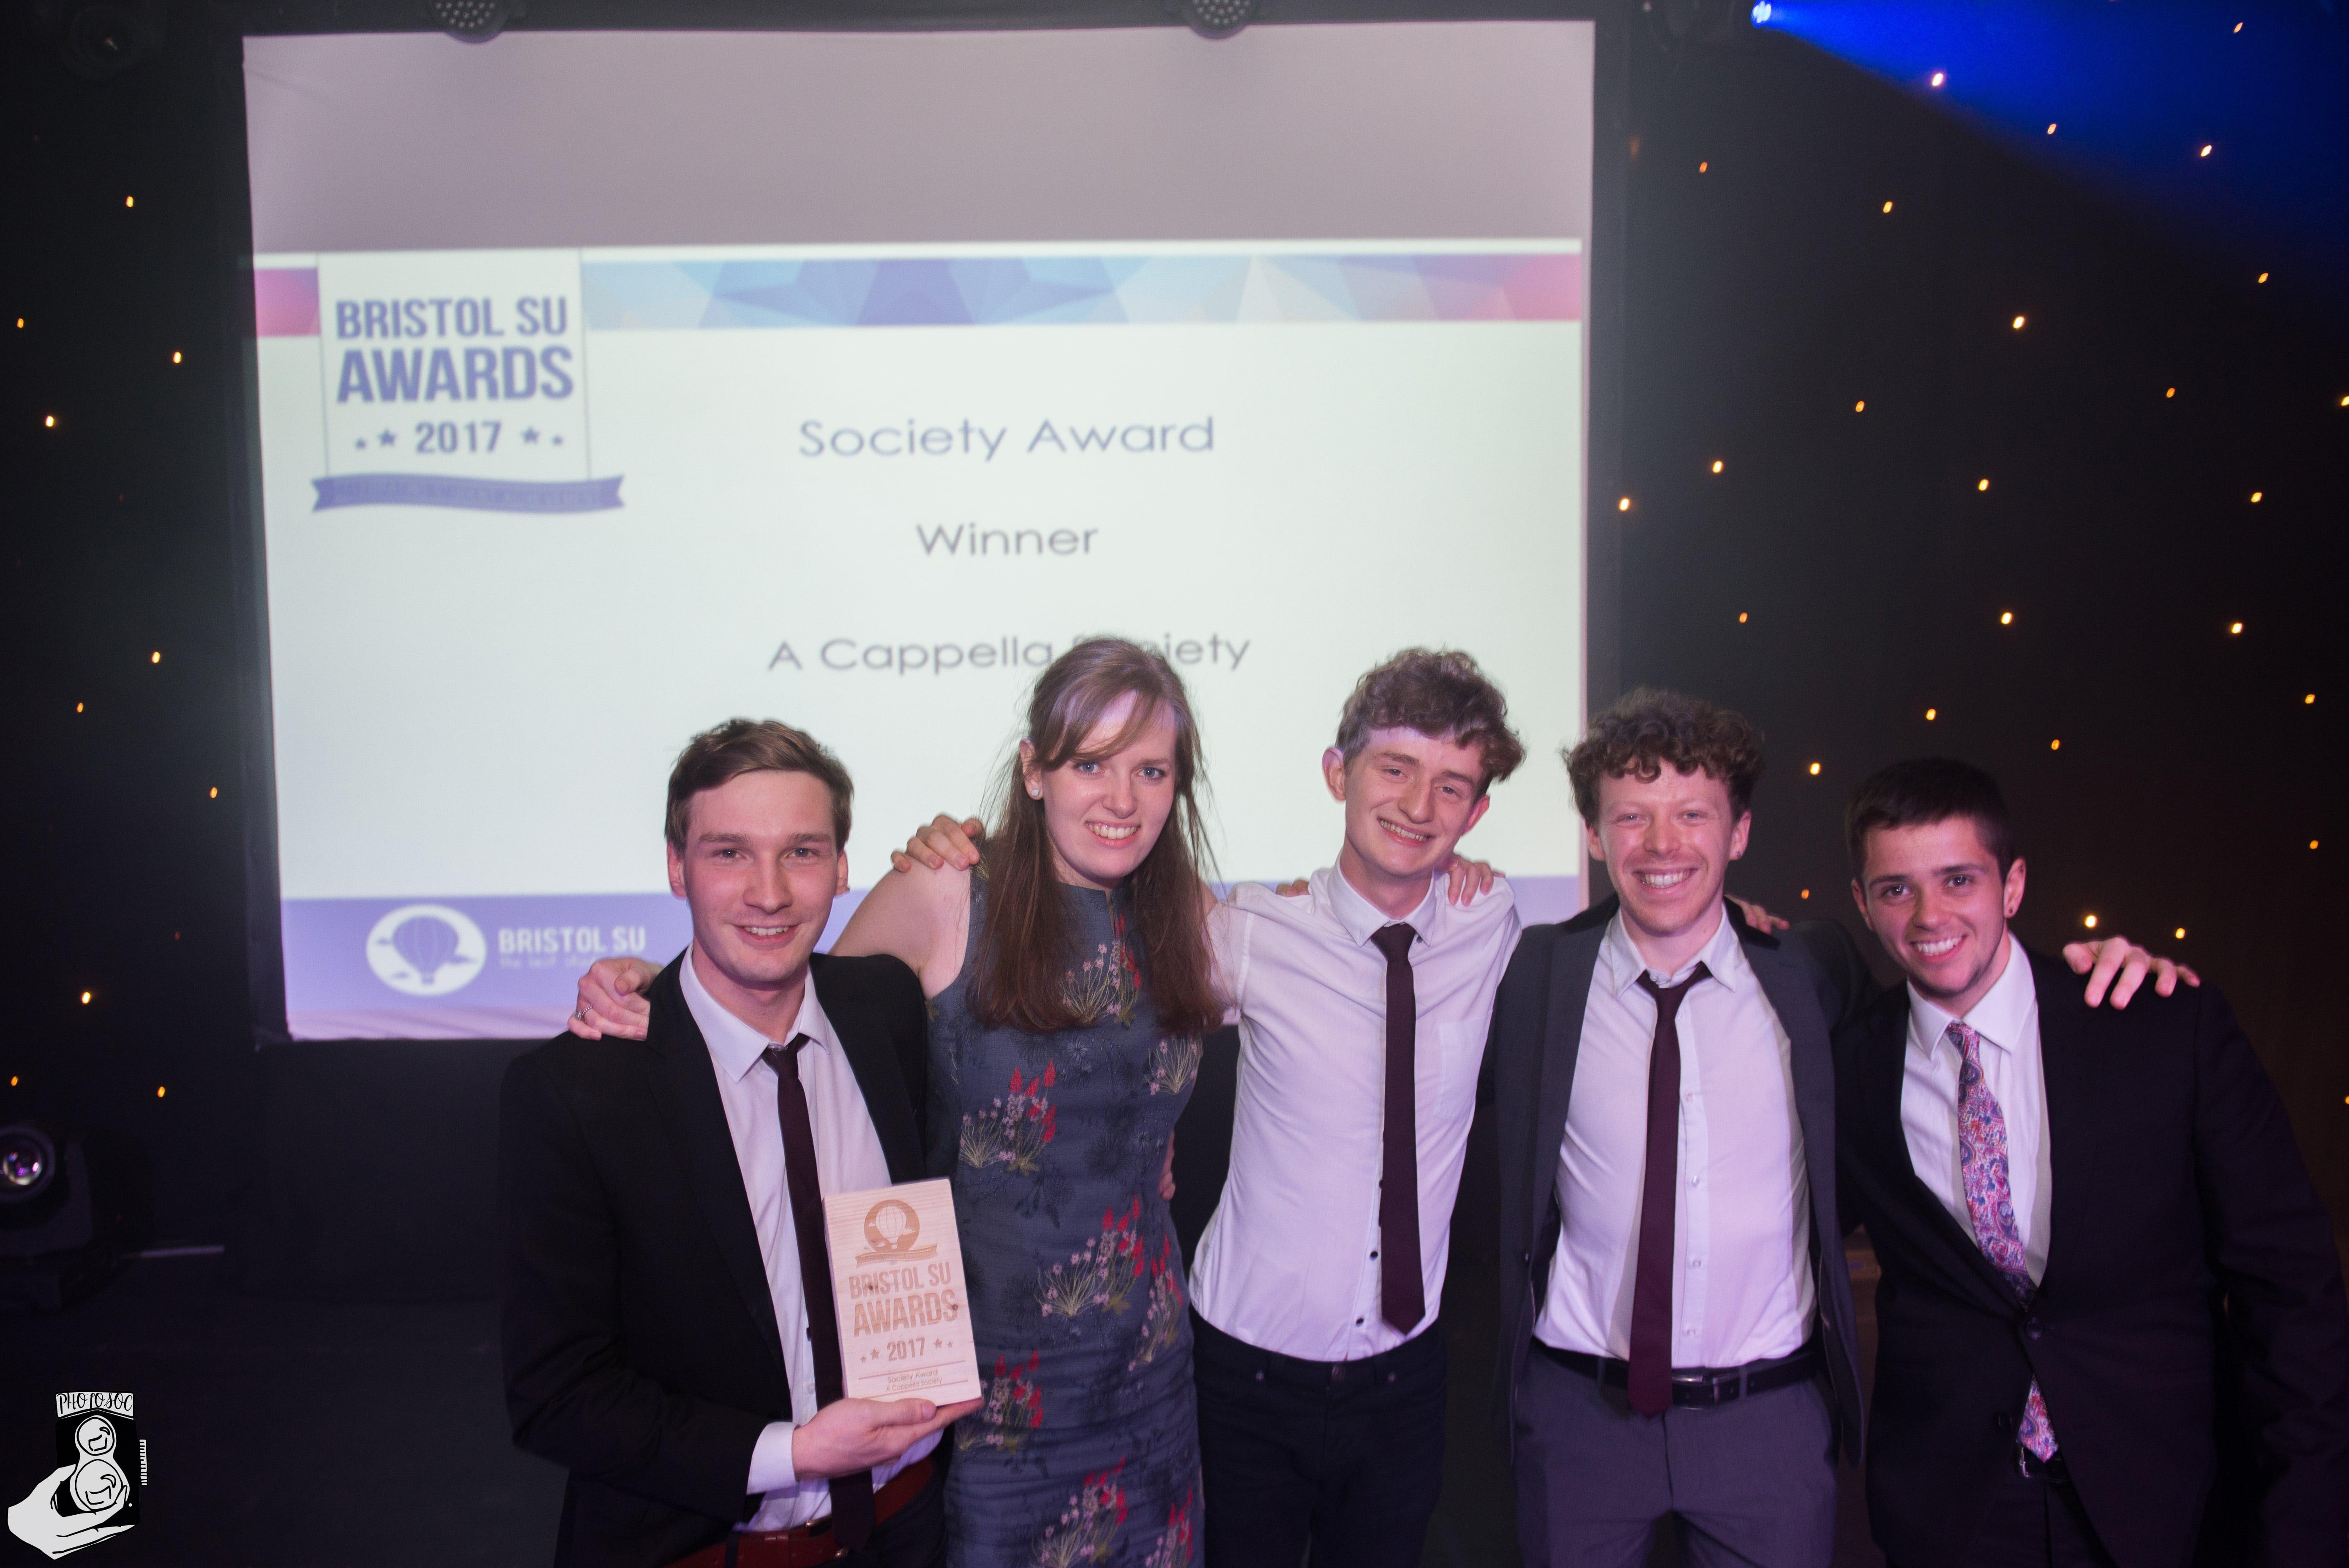 Members of A Cappella Society accepting society award